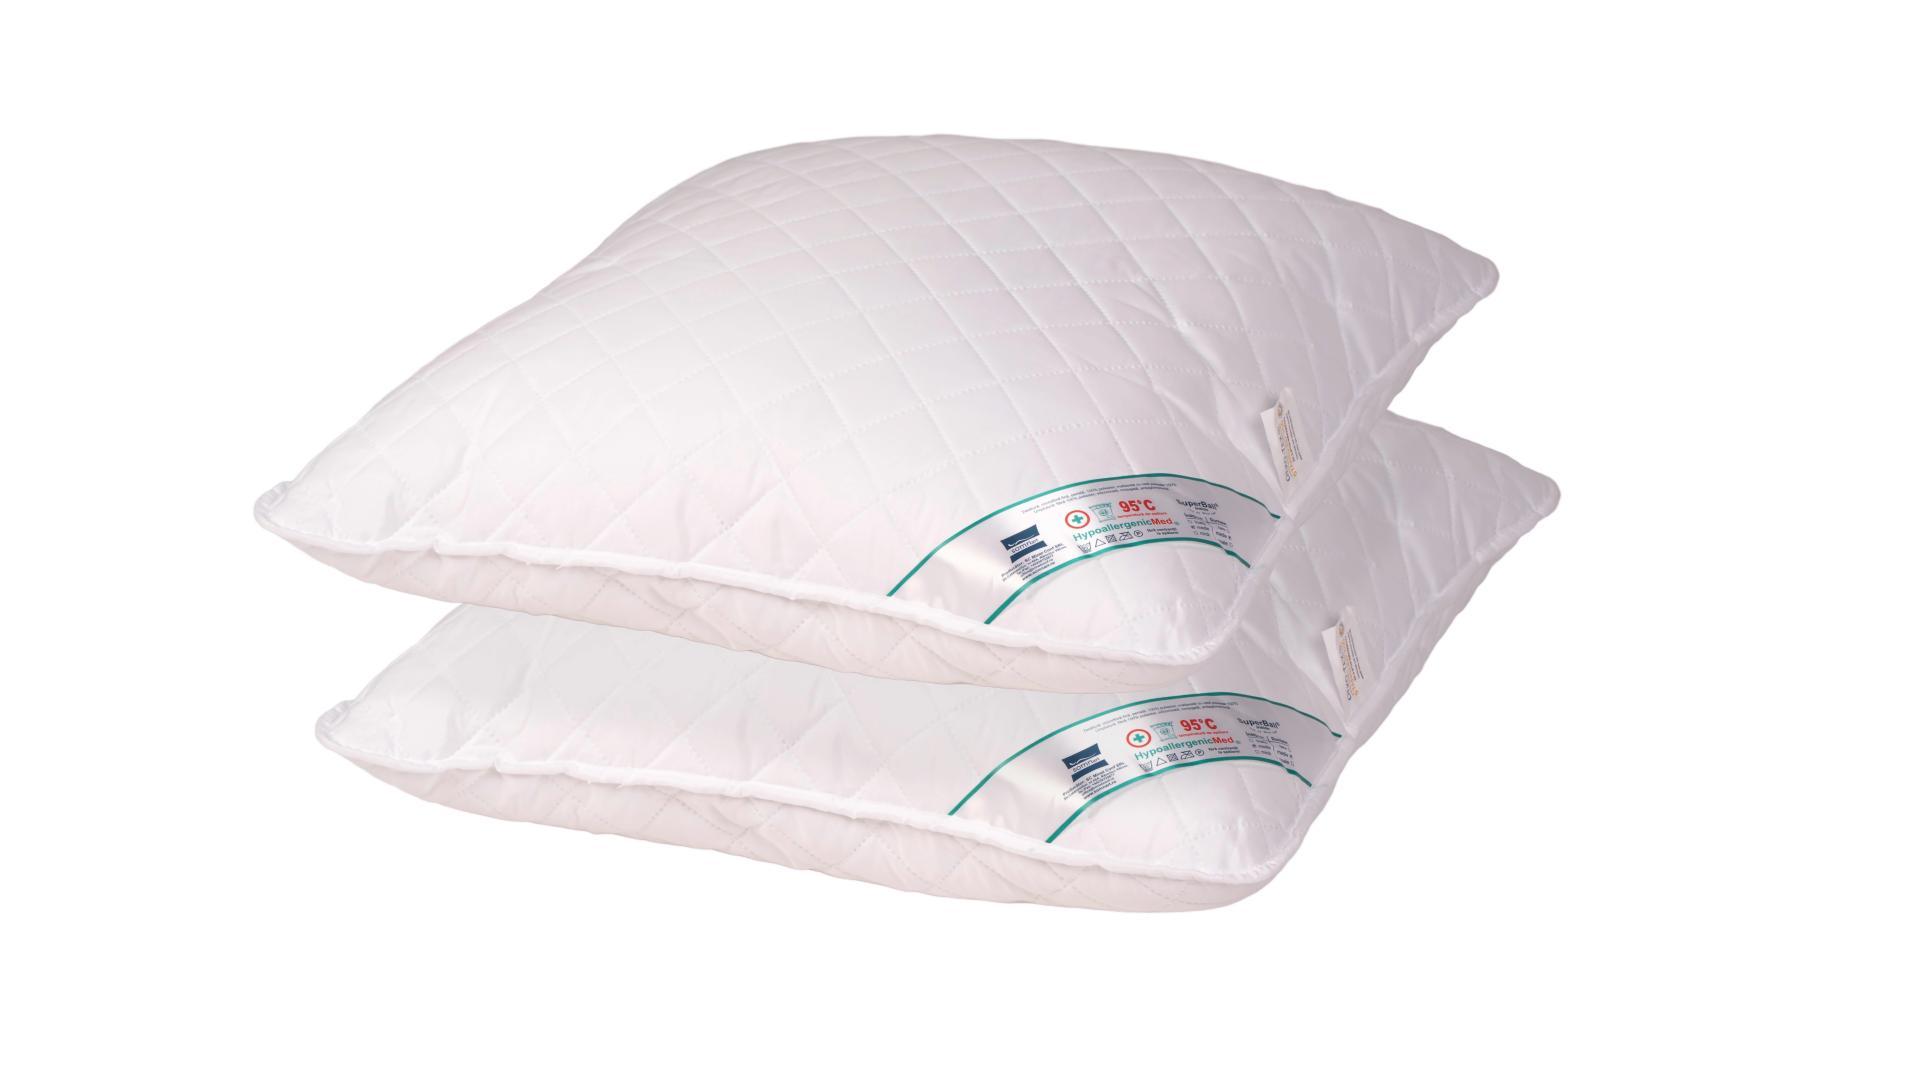 Set 2 perne hipoalergenice Somnart HypoallergenicMed, lavabile la 95°C - 40x40 imagine 2021 somnart.ro